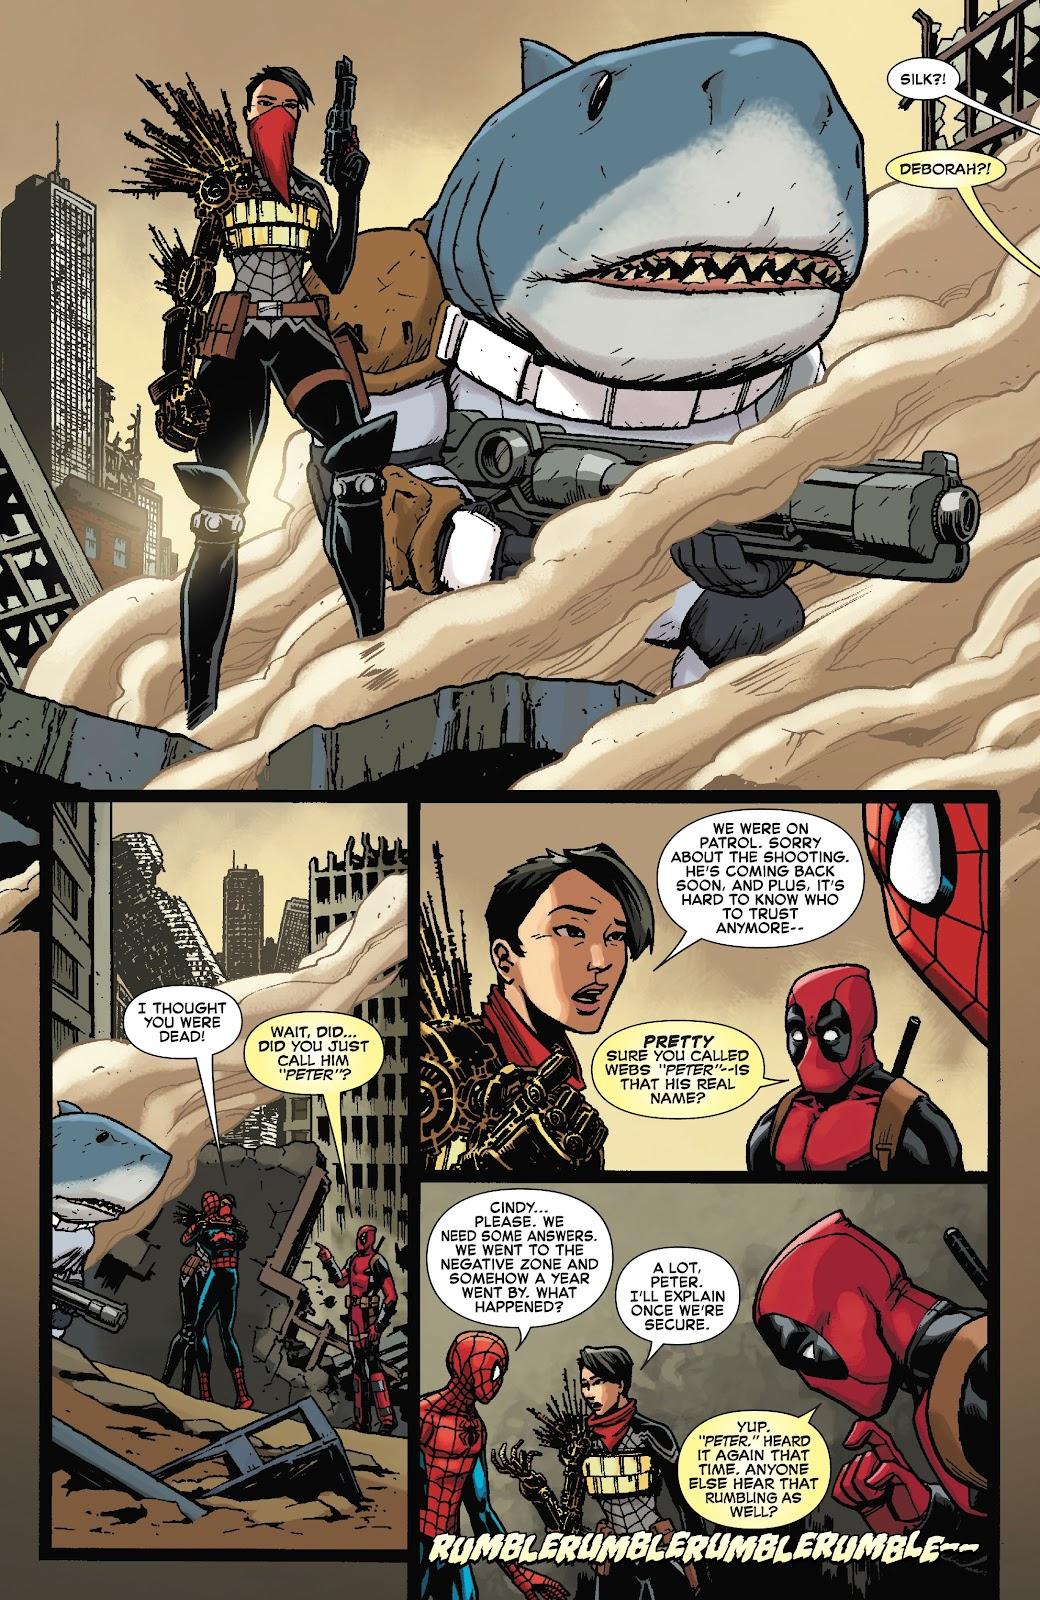 Read online Spider-Man/Deadpool comic -  Issue #46 - 12